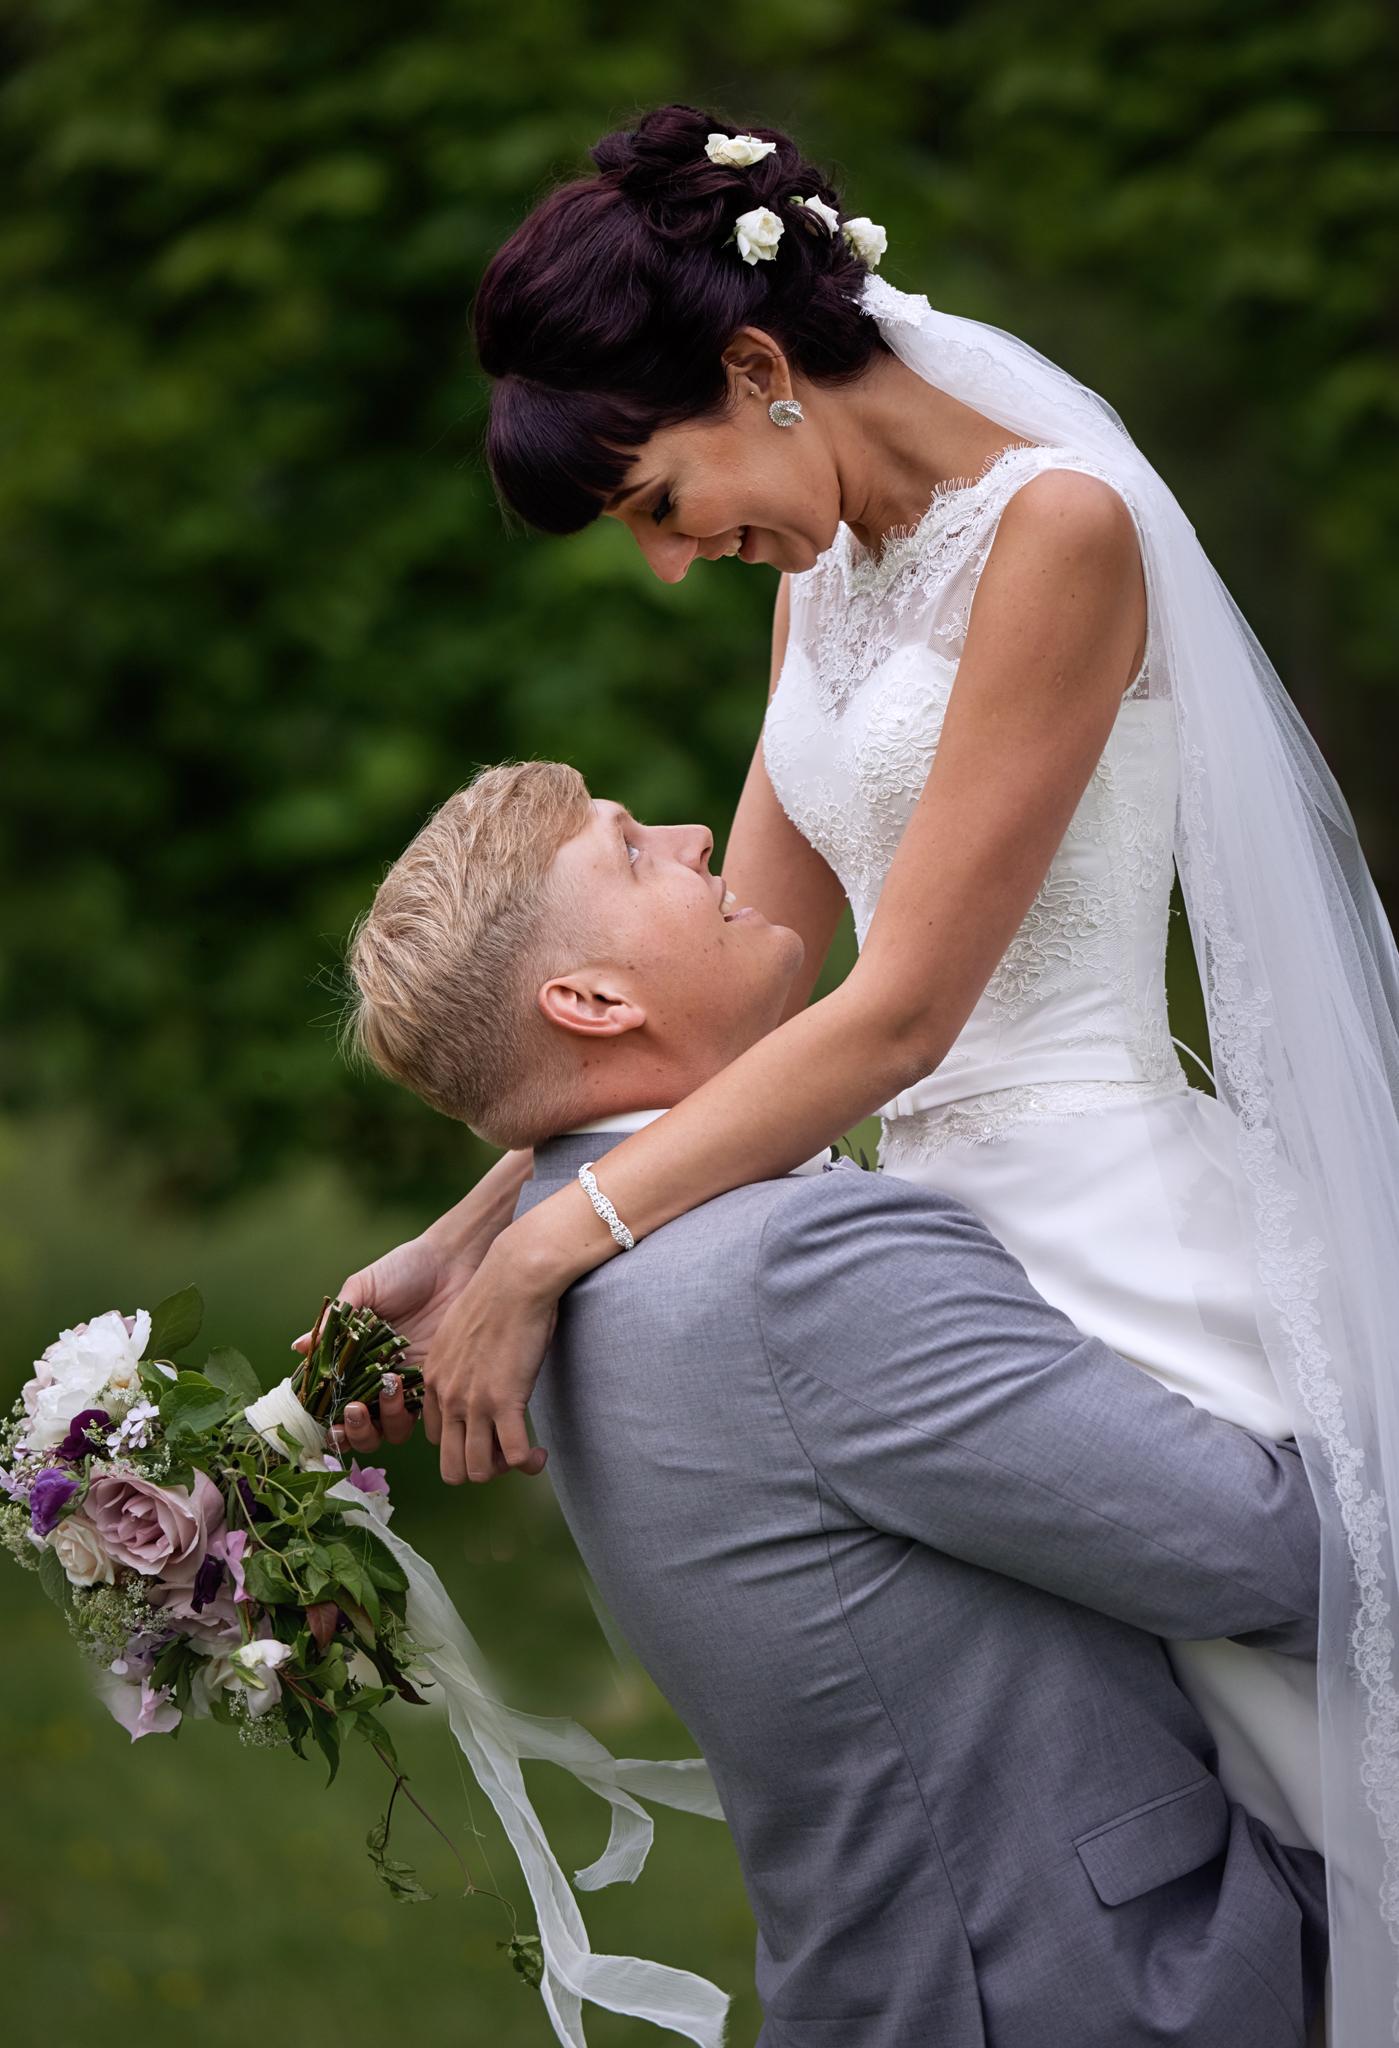 Groom holding the bride, wedding photo